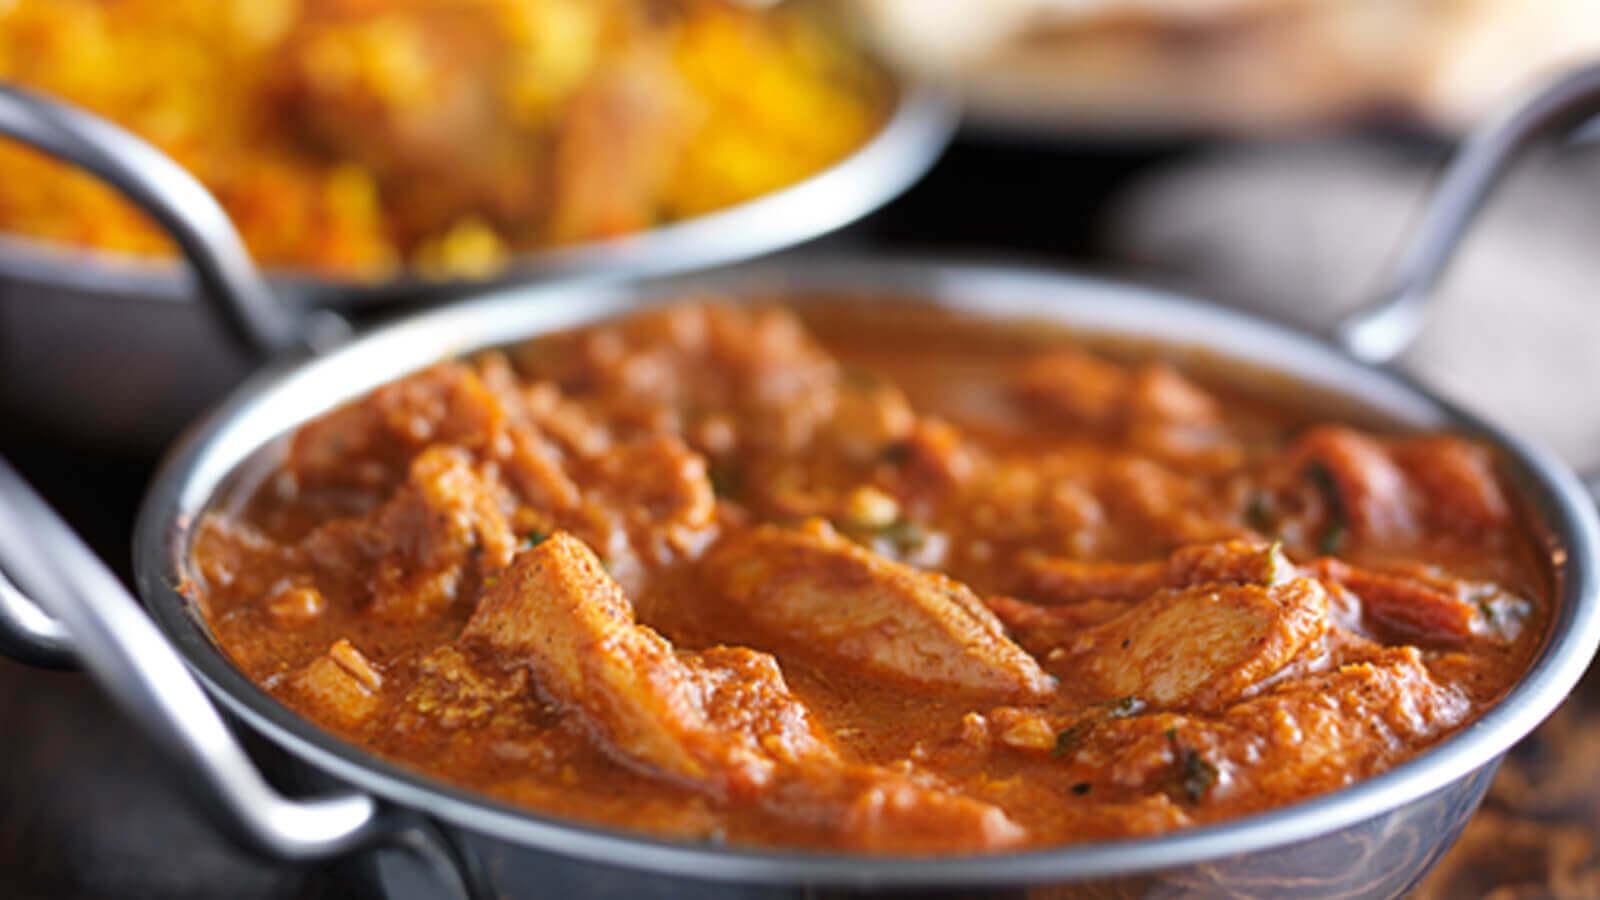 Spice of India Ltd